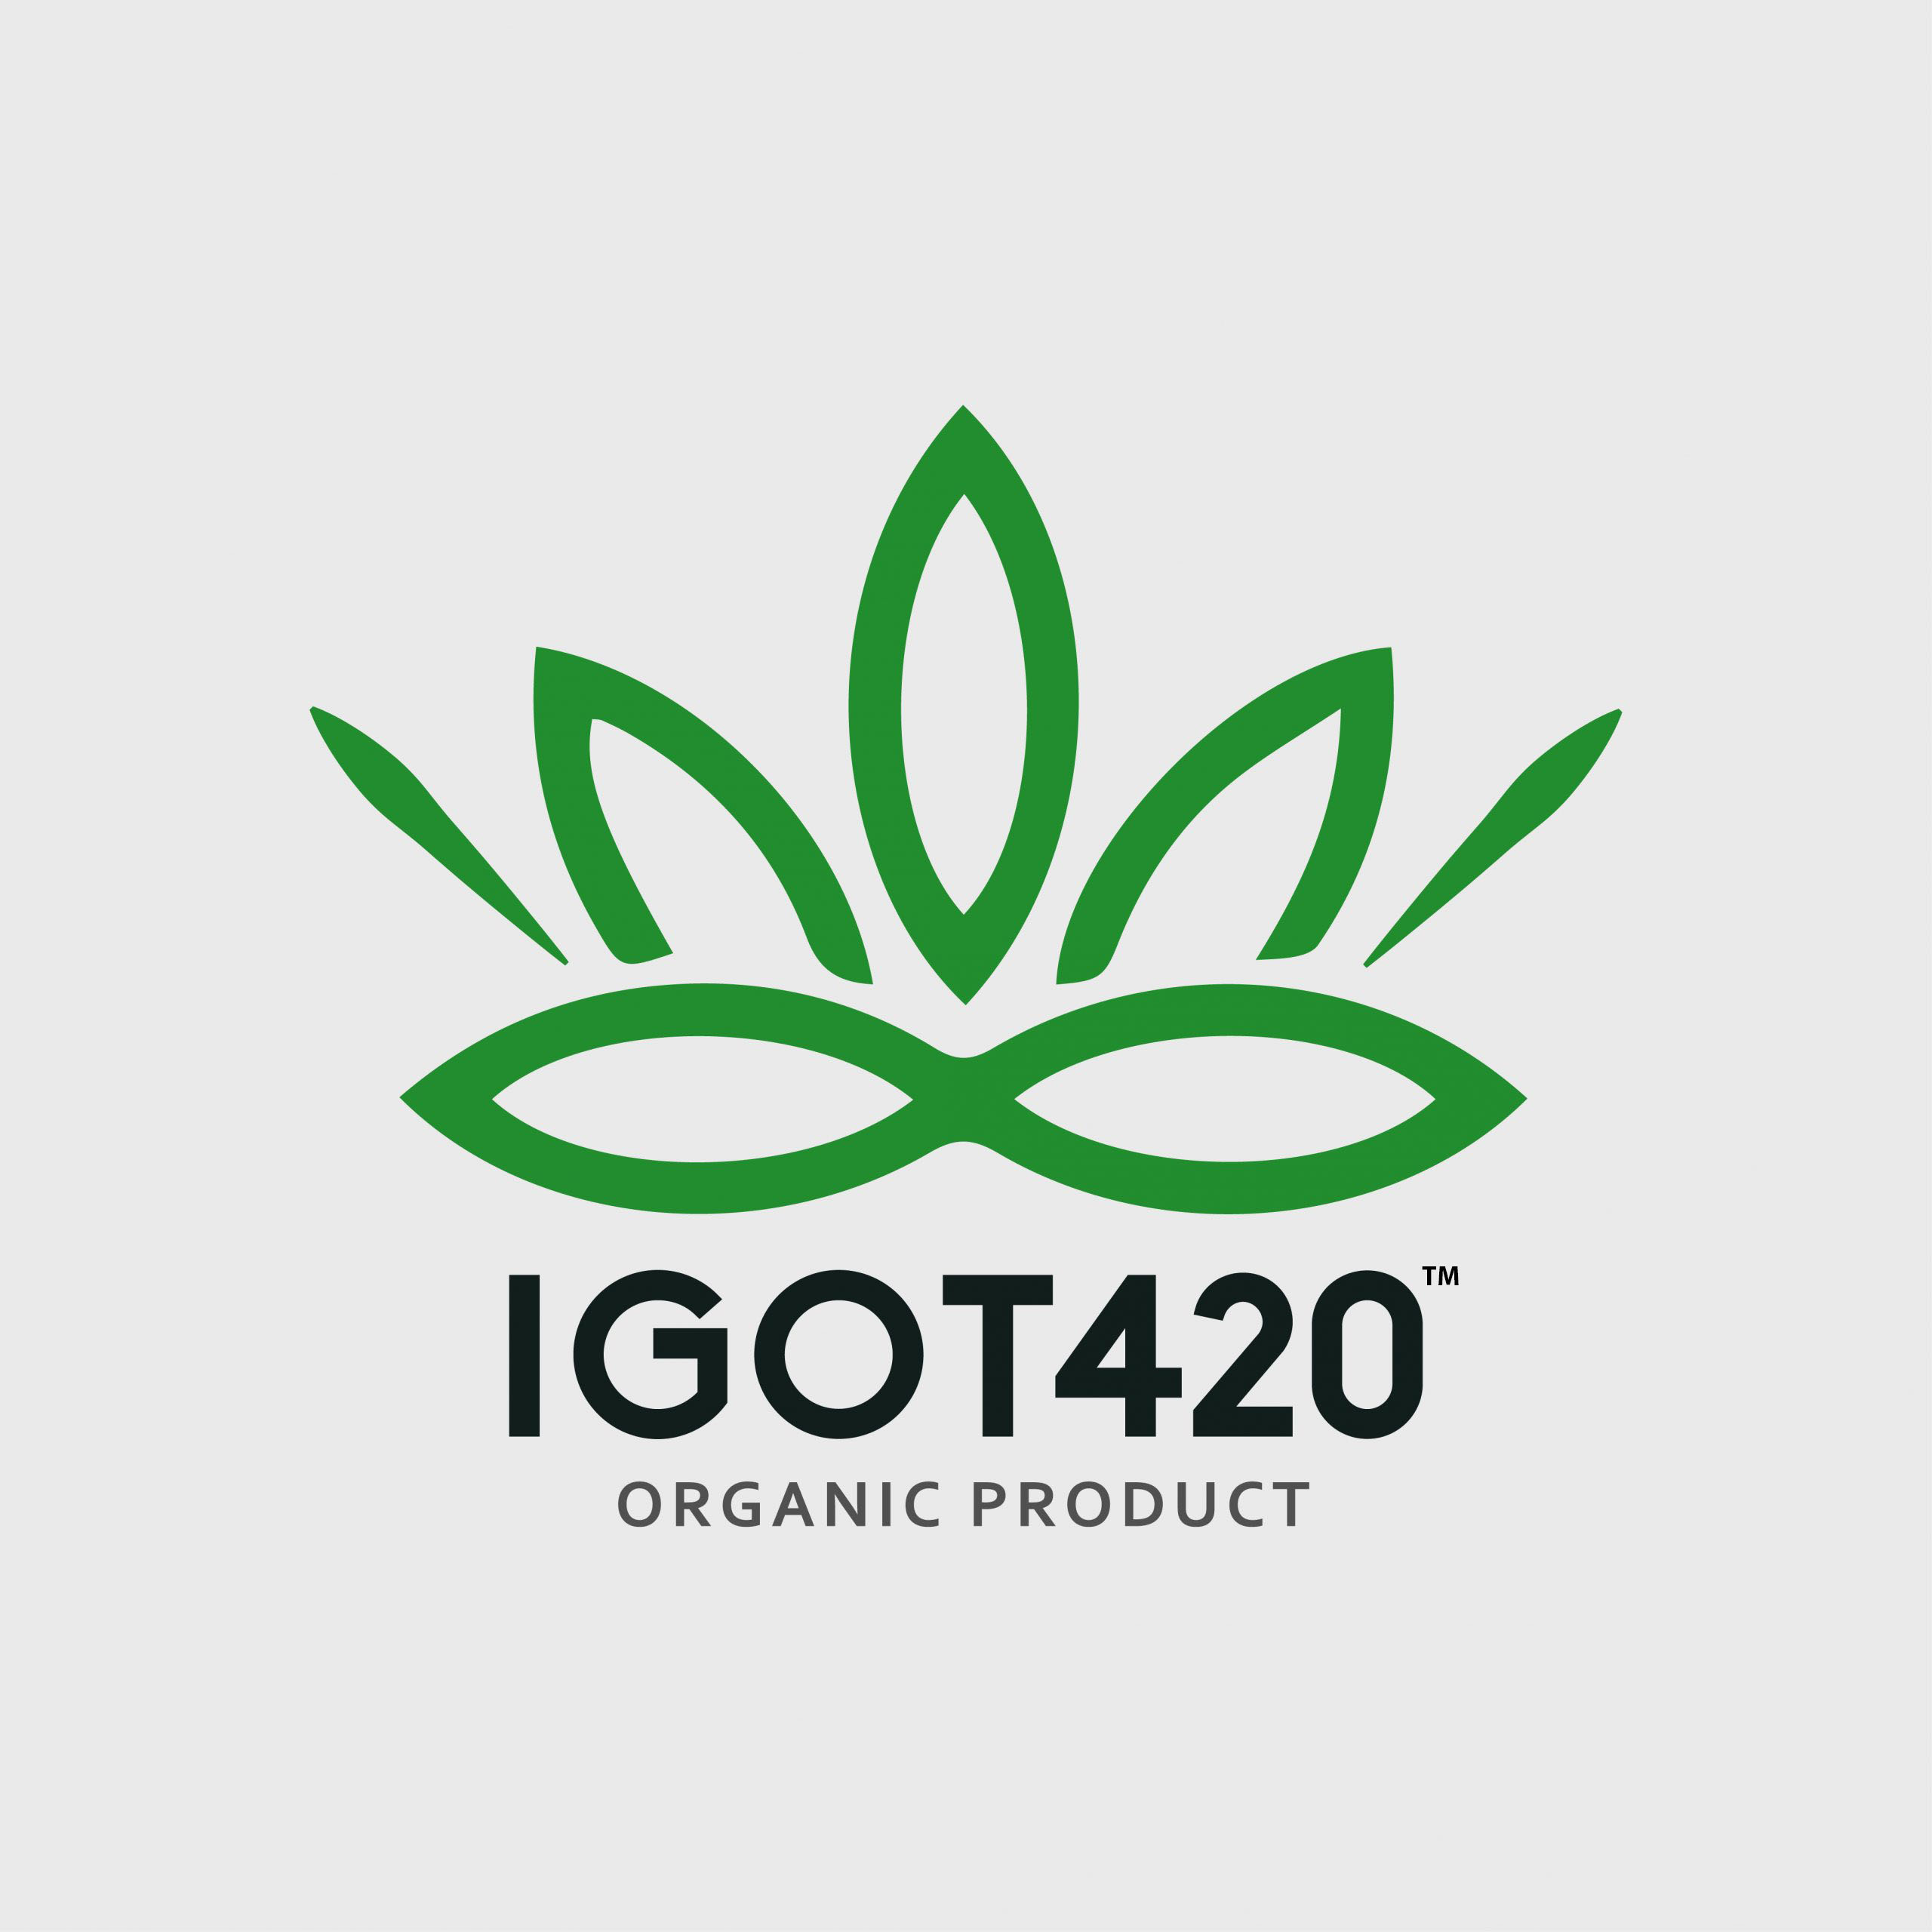 iGOT420